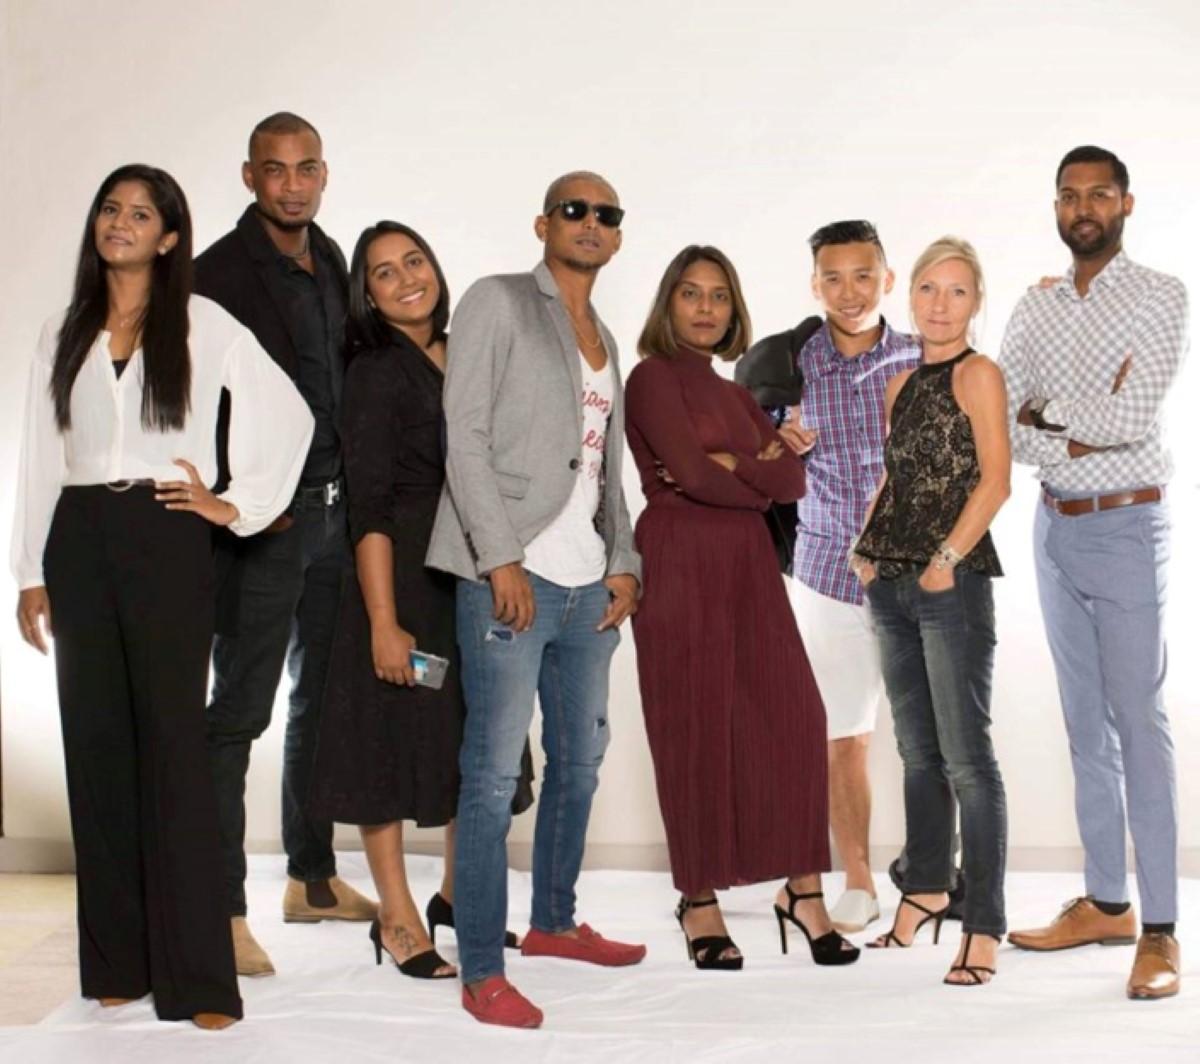 "Les ""stars"" de Planet Fm : Ashna Nuckcheddy (ex R1, ex l'express), Subashnee Mahadao (ex Radio plus), Anousha P. Junggee (ex le Matinal), Jimmy Gassel (ex R1), Maesh Soneea (ex R1, Radio Plus), Thierry Ng, Florence Barnichon Luron, Mr Love-Ludovic Lamarque (ex R1)."